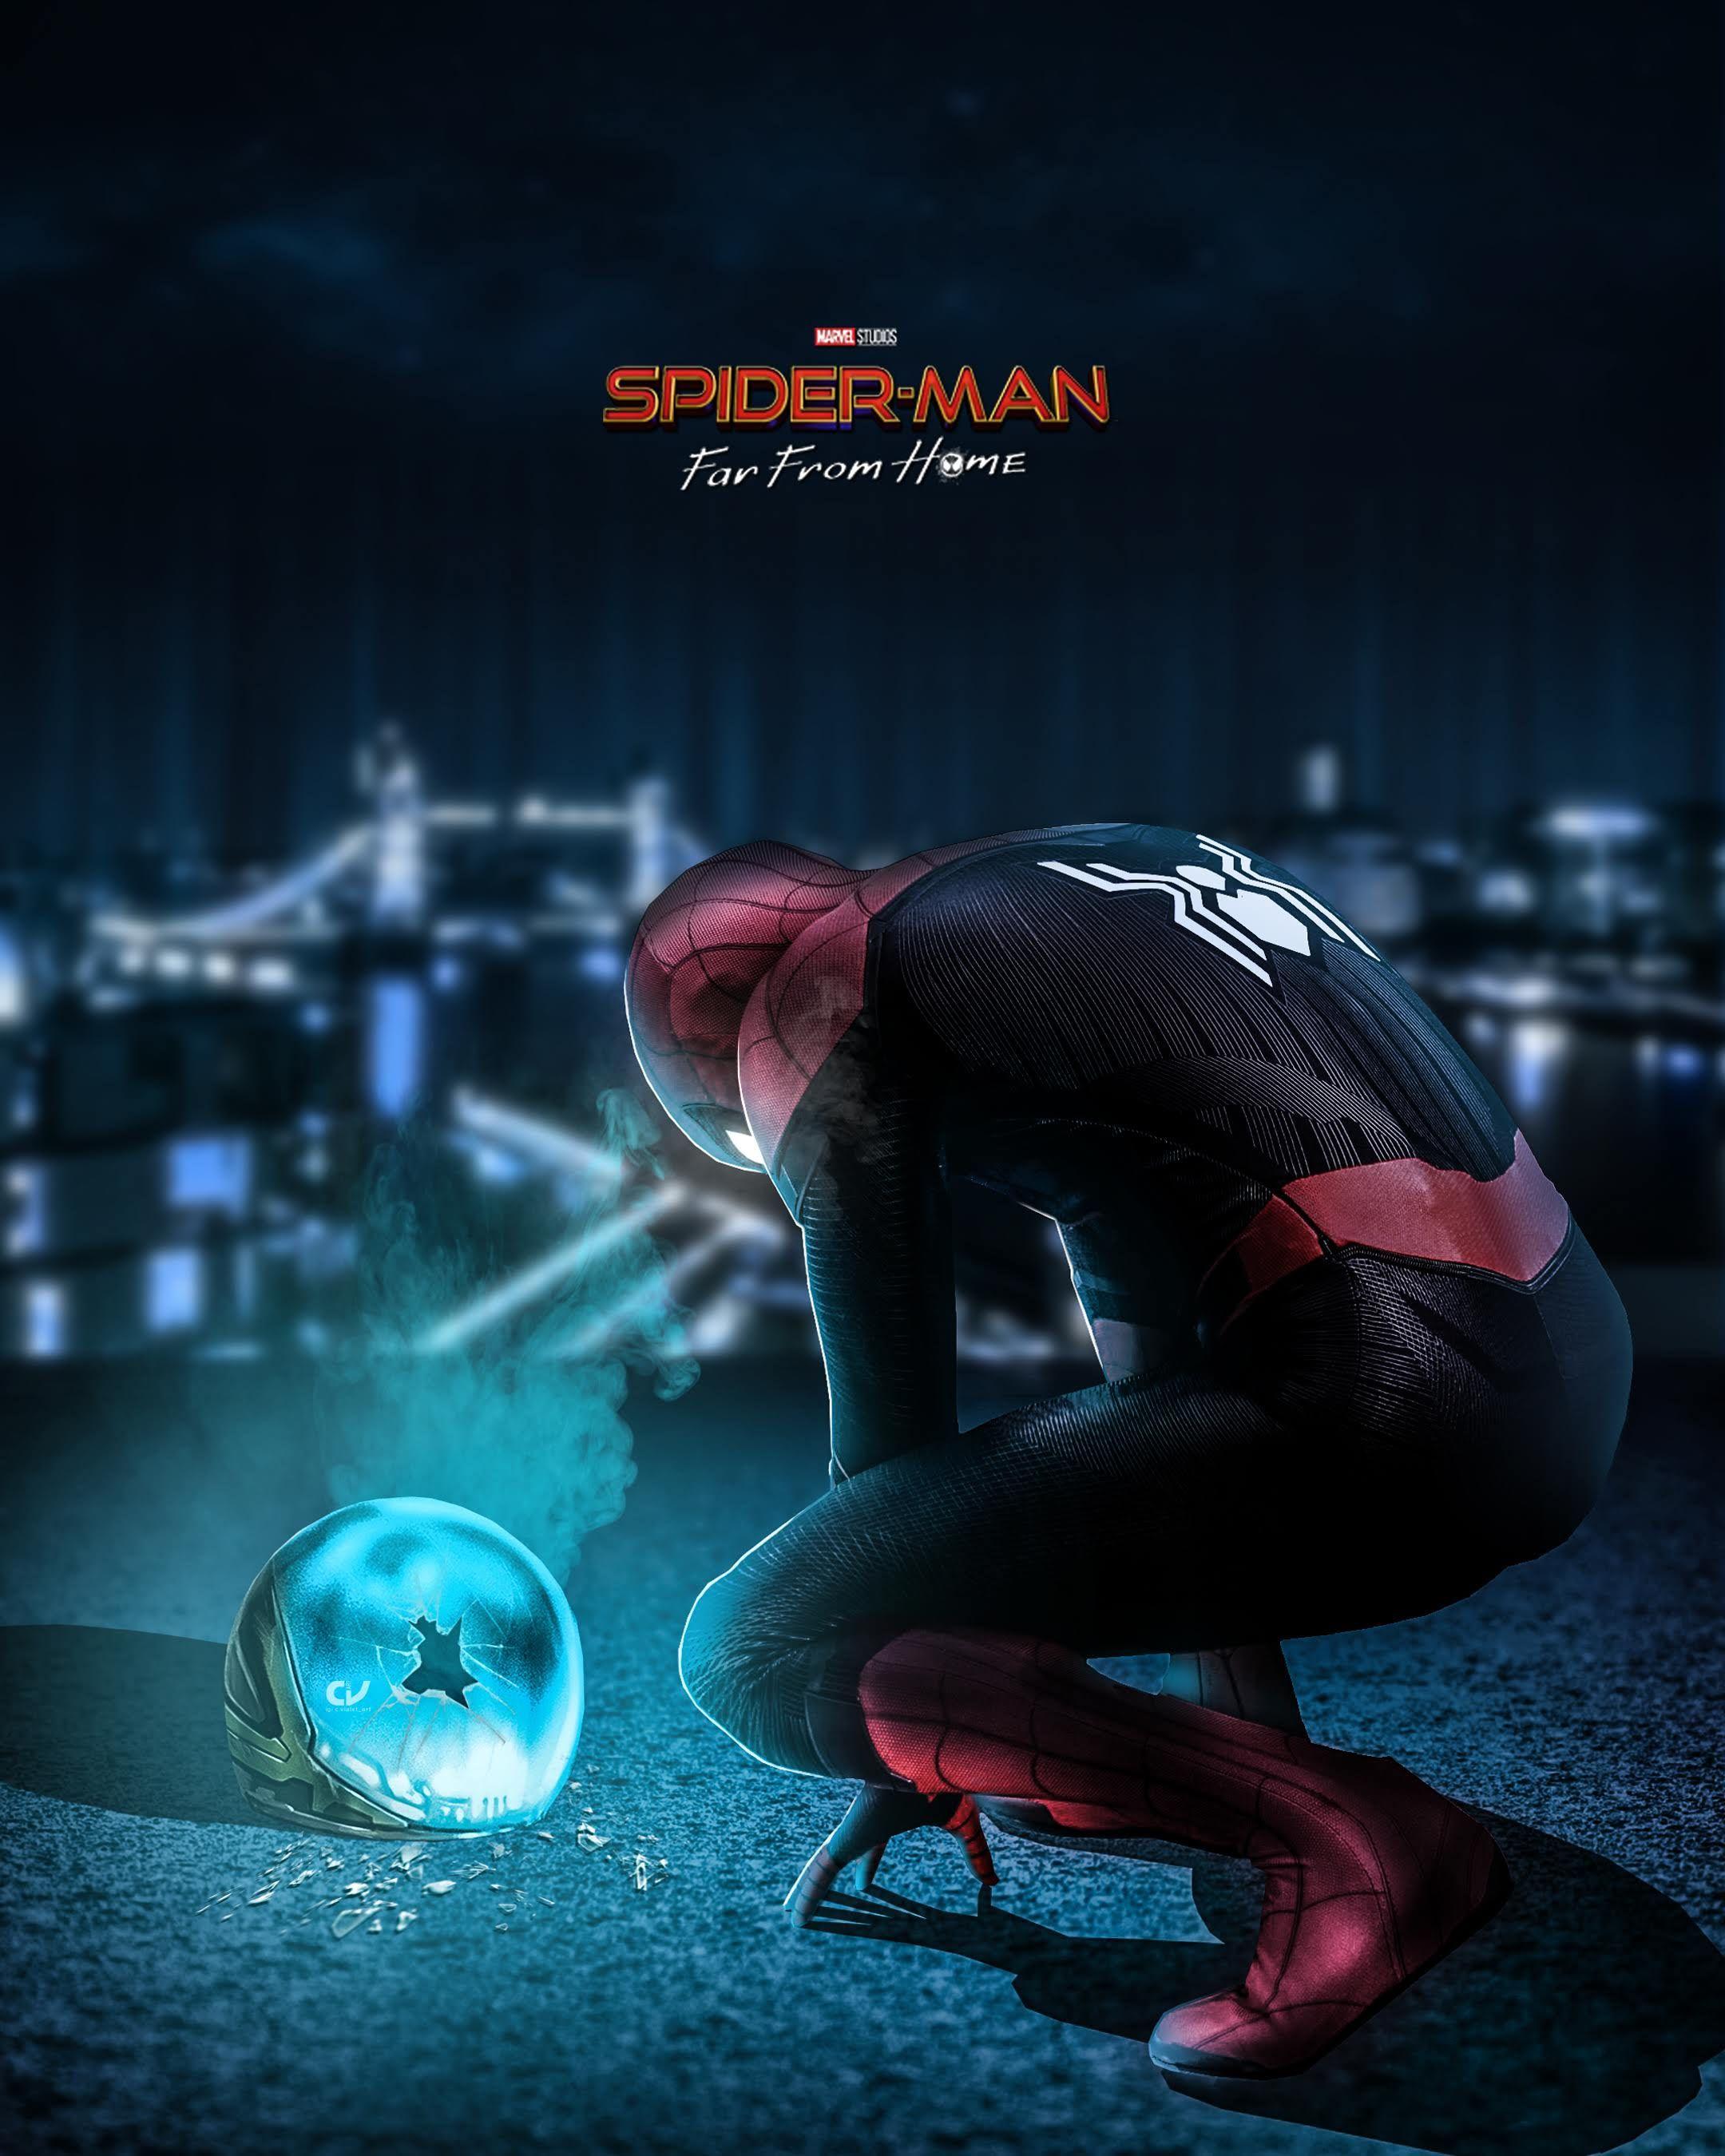 Pin By Joshua Vicente On Spider Man Spiderman Comic Marvel Spiderman Marvel Superheroes